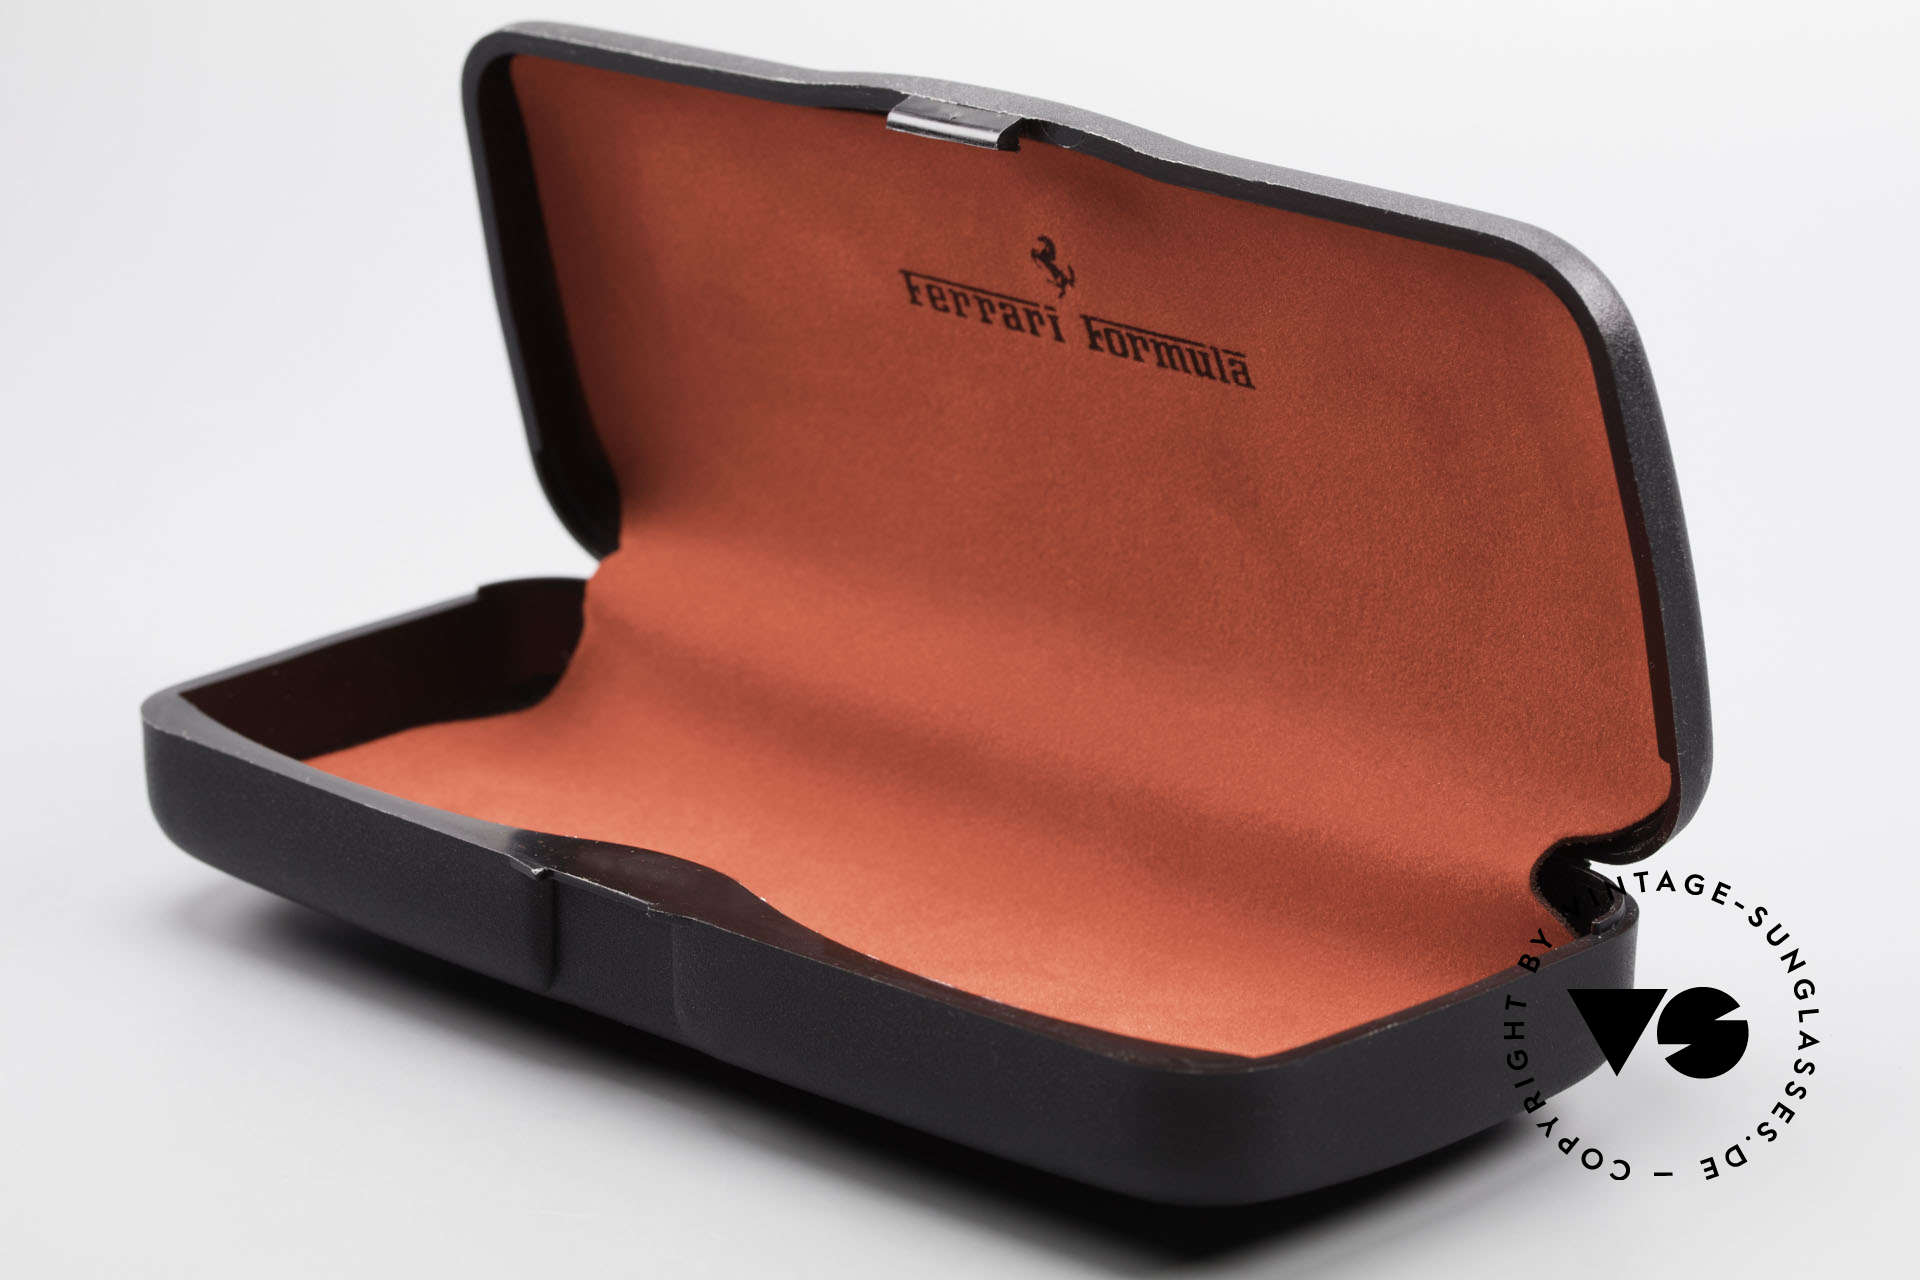 Ferrari F12 Old Vintage Luxury Sunglasses, Size: large, Made for Men